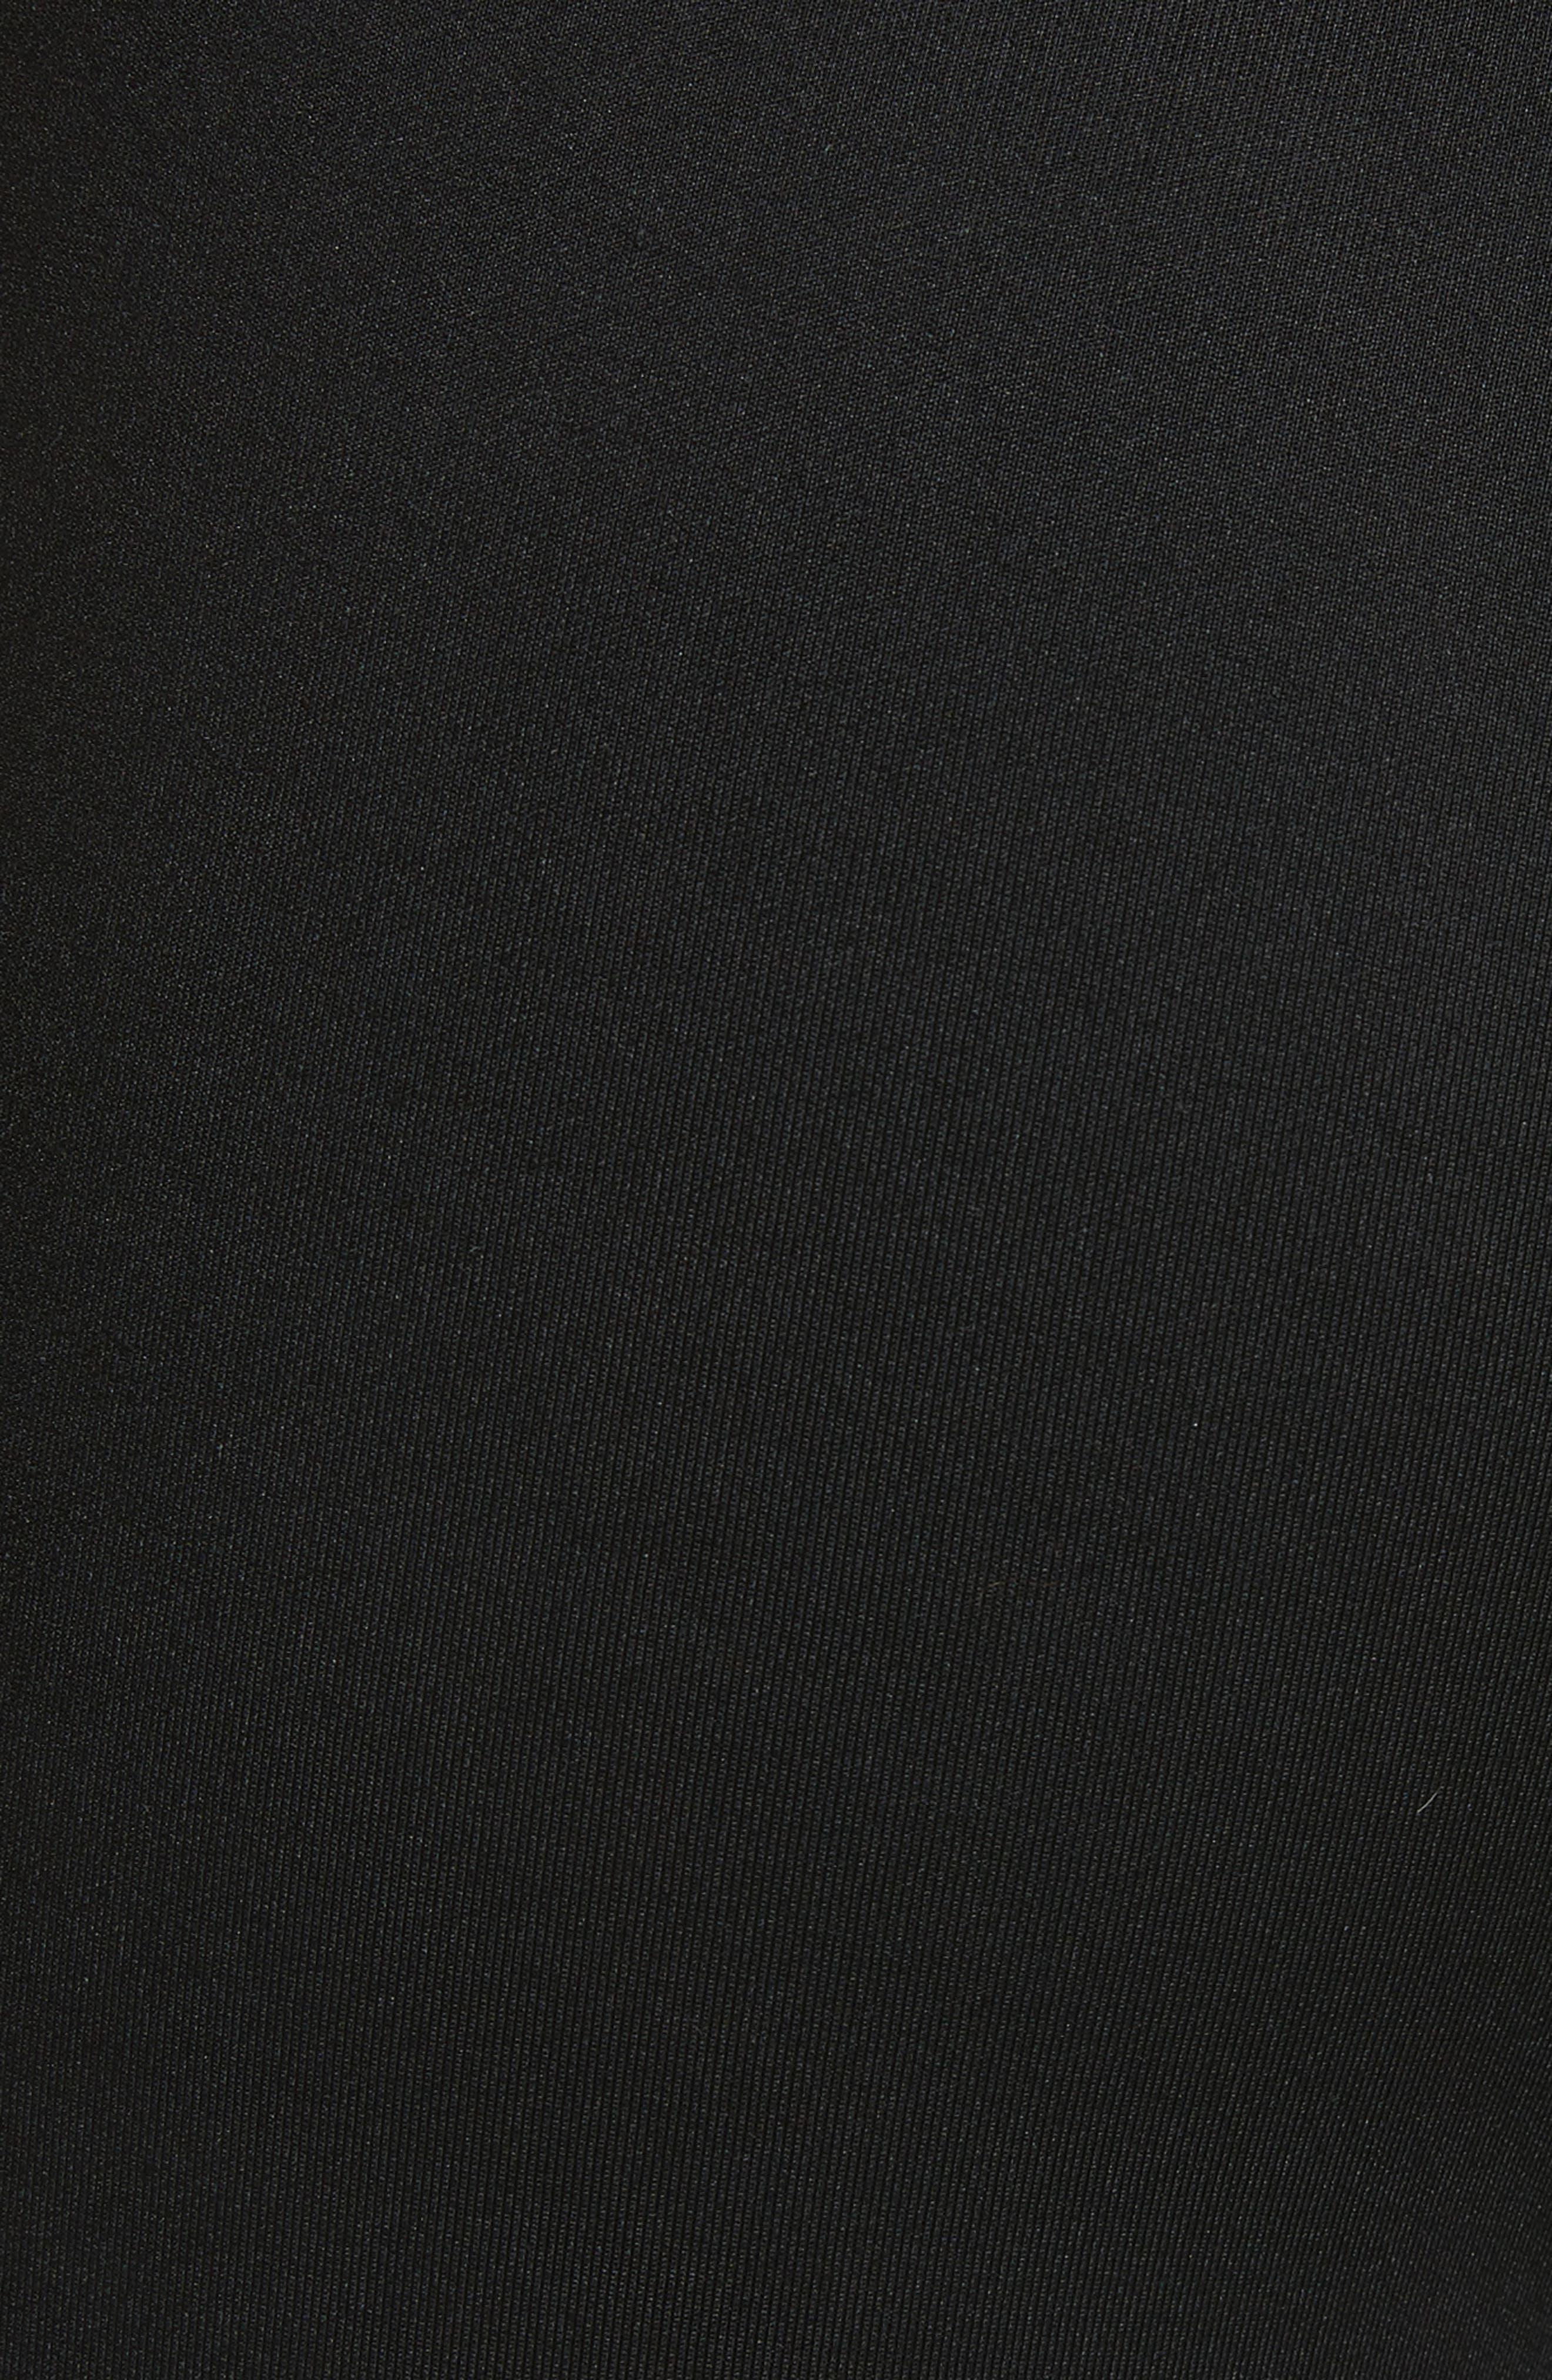 Tricot Track Pants,                             Alternate thumbnail 5, color,                             Black